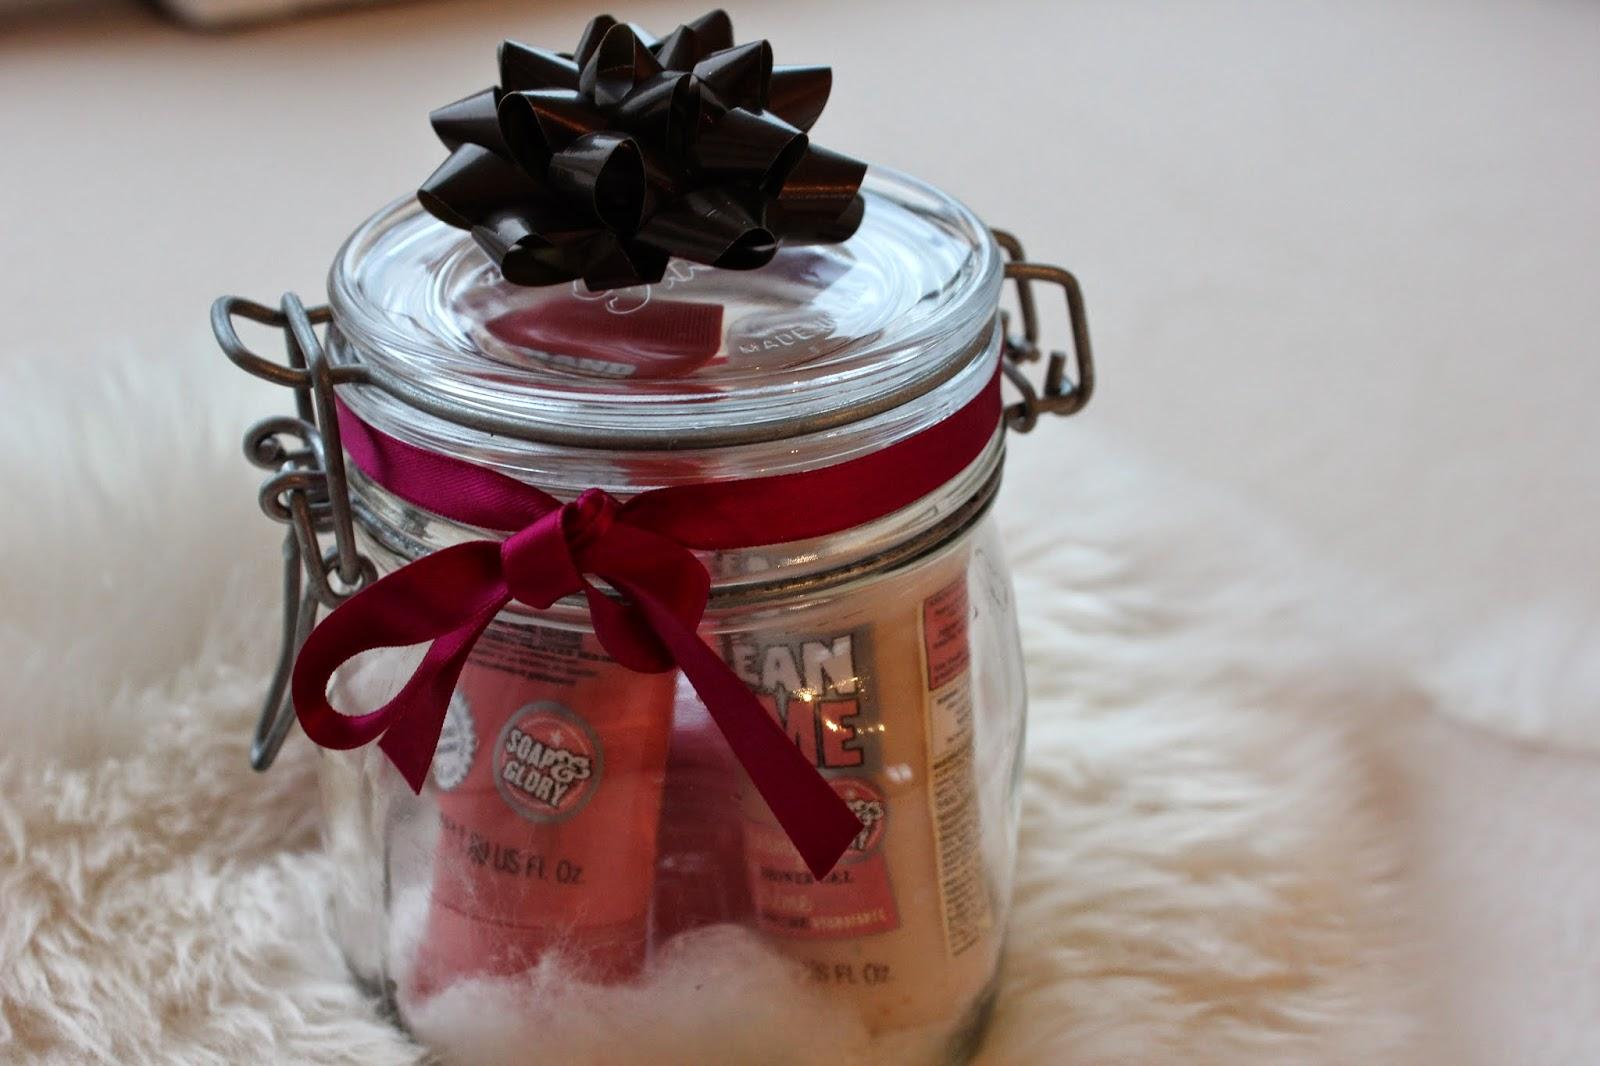 kusselina adventskalender t rchen 23 geschenke verpacken mal anders. Black Bedroom Furniture Sets. Home Design Ideas